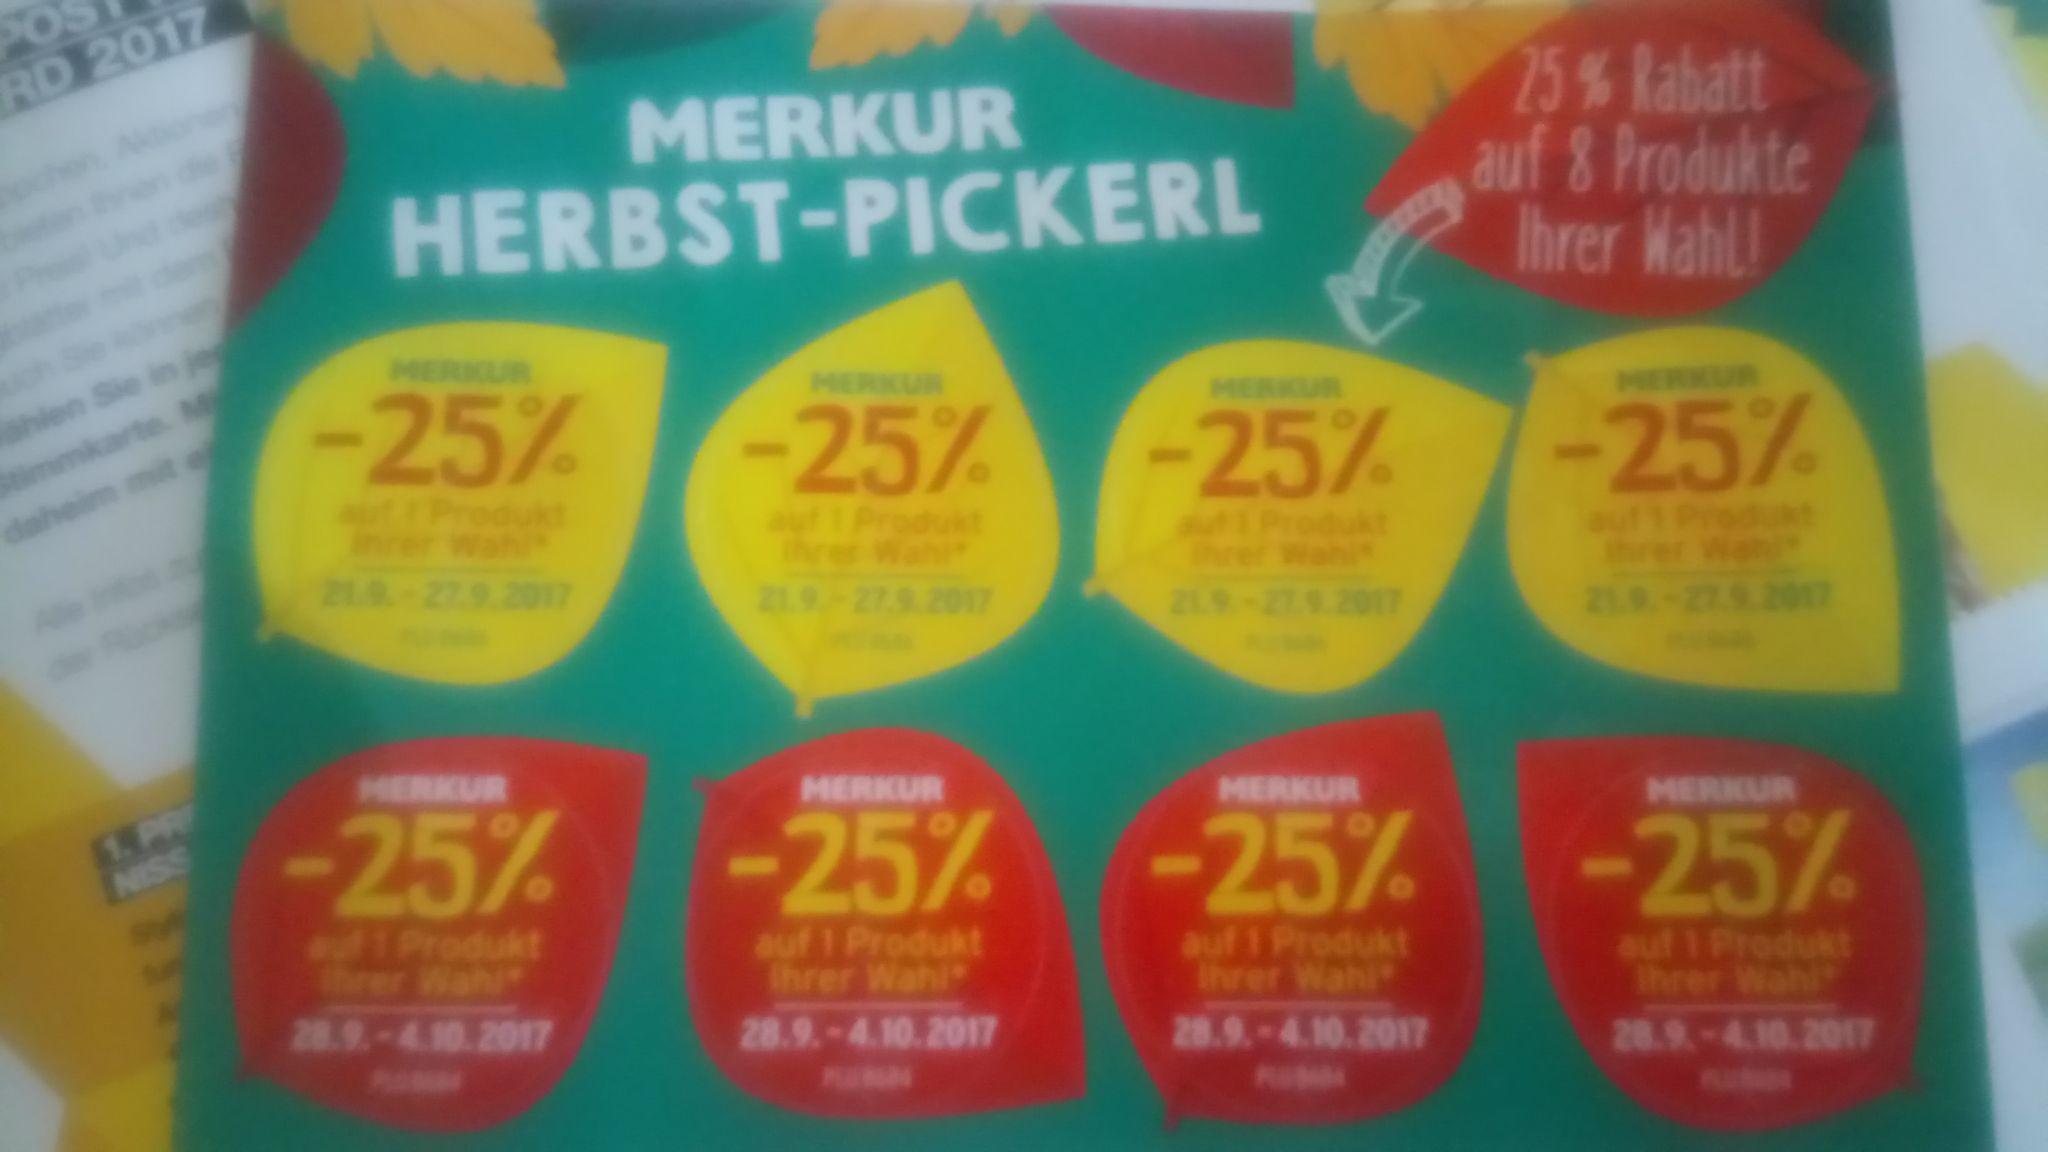 MERKUR >> 25% Herbst-Pickerl im aktuellen Flugblatt